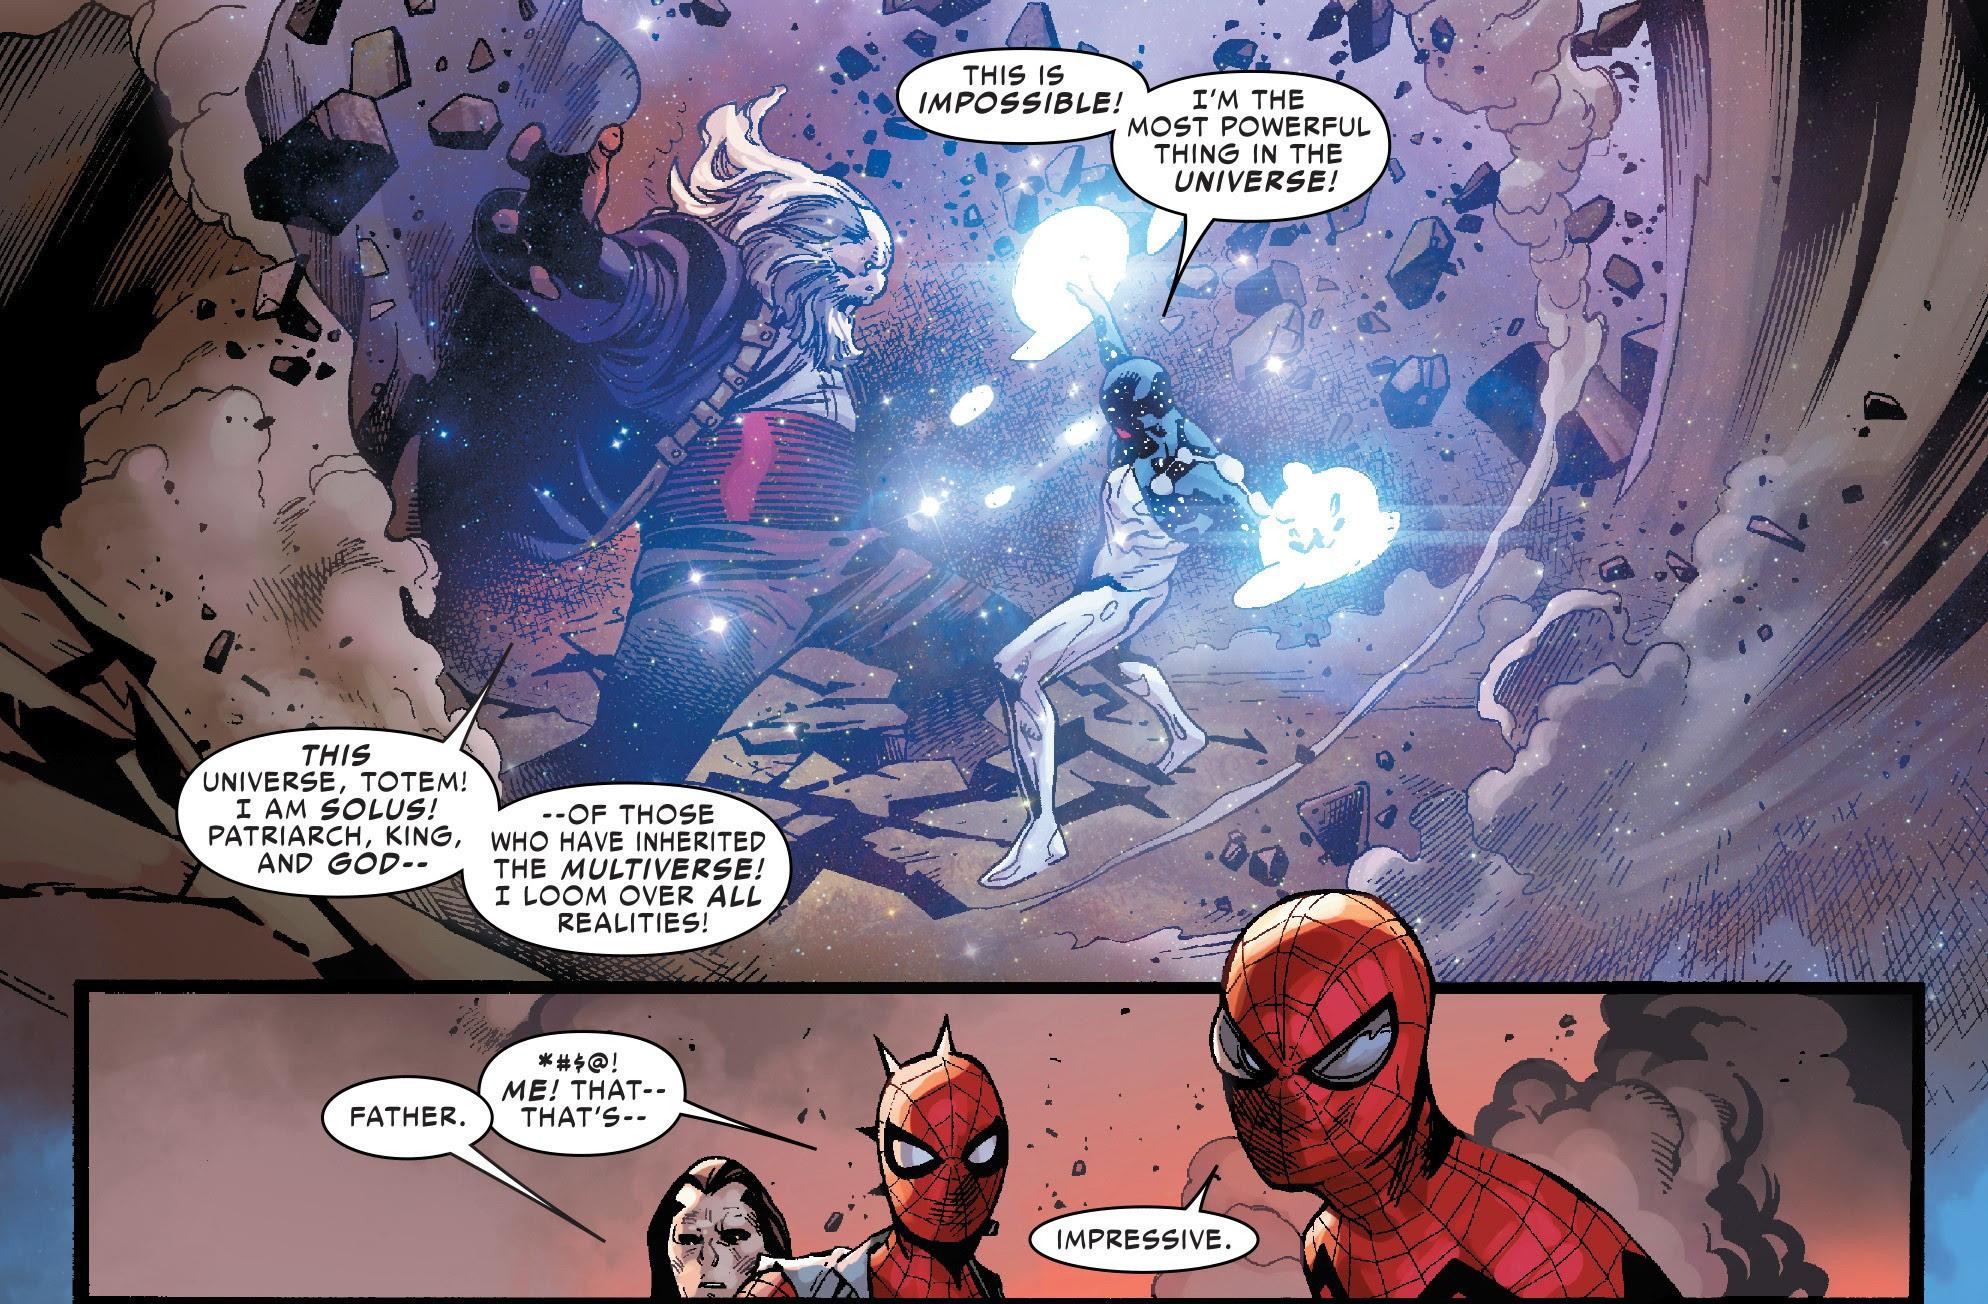 http://www.spidermancrawlspace.com/wp-content/uploads/2014/12/AmazingSpider-Man201411-p18.jpg